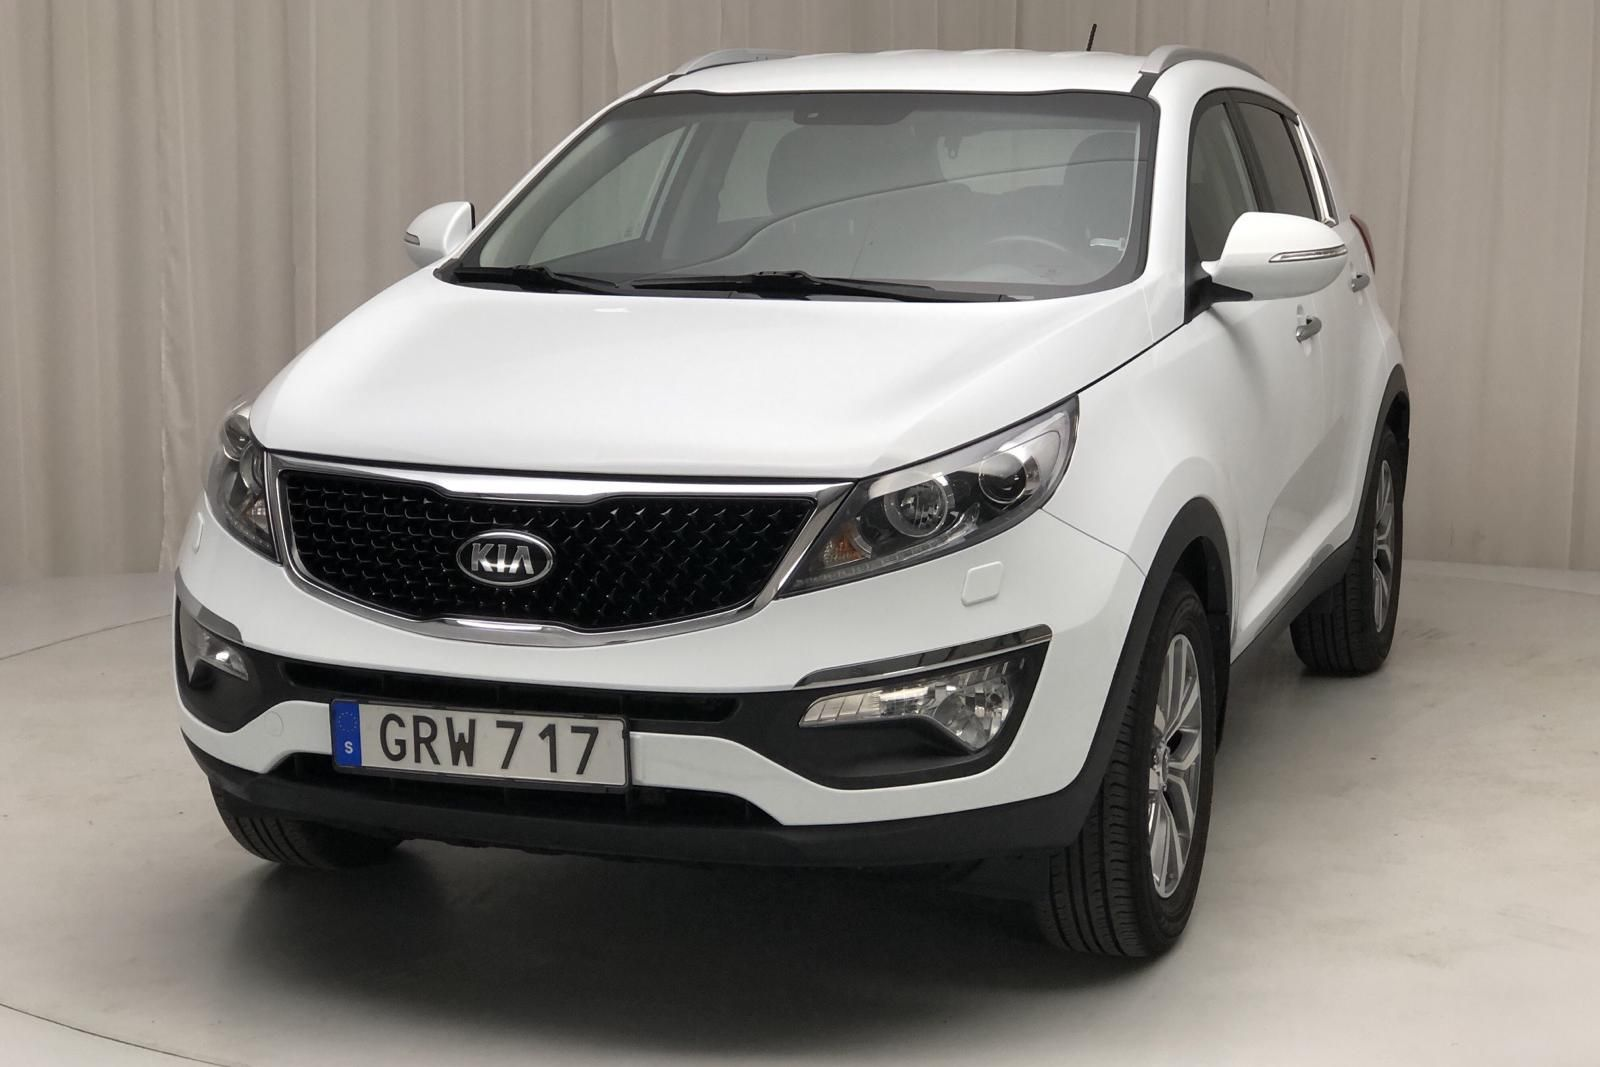 KIA Sportage 1.6 2WD (136hk)